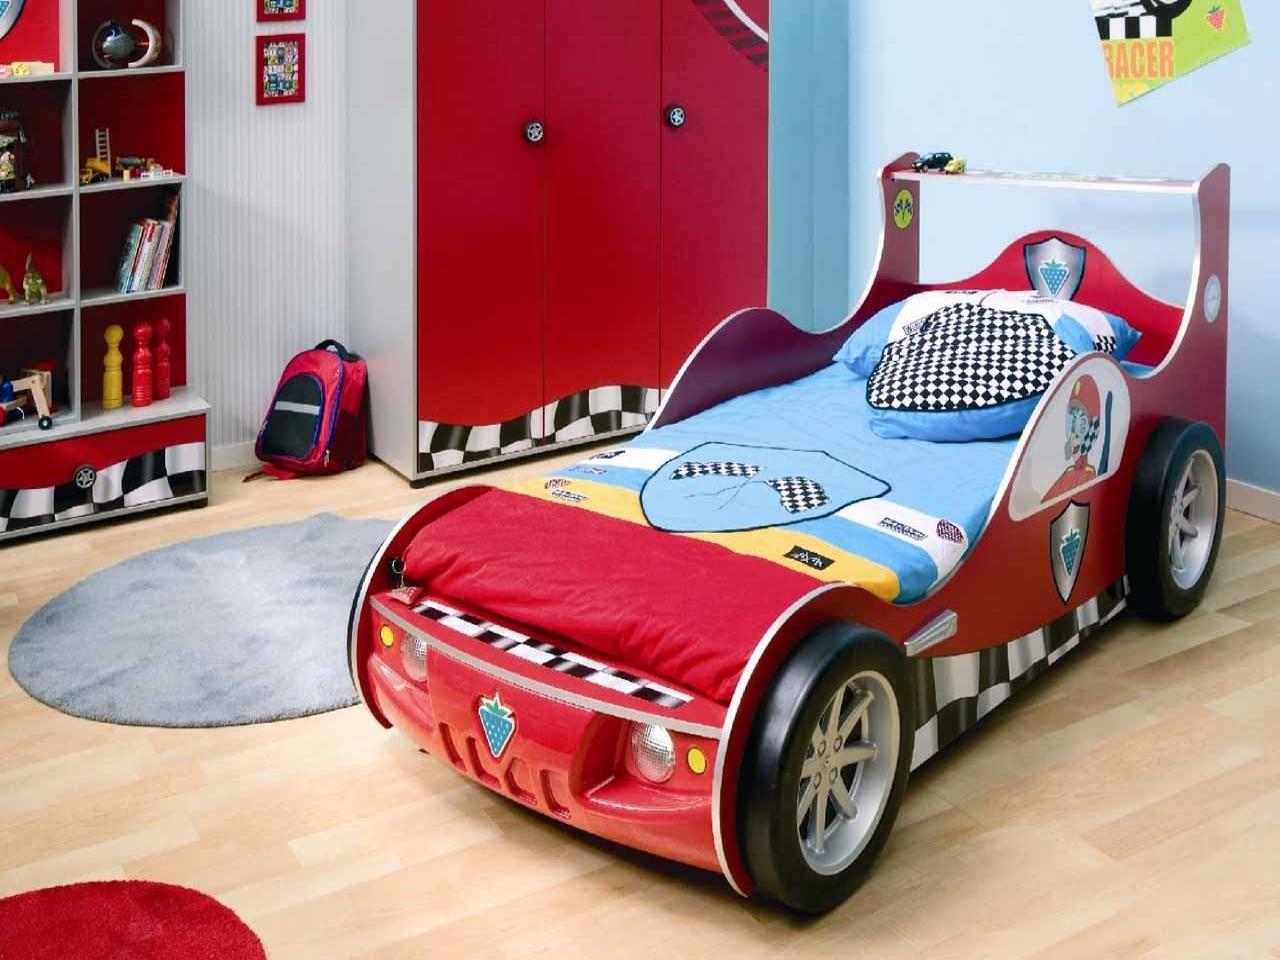 غرف نوم اطفال على شكل سيارة Race-car-themed-boys-room-ideas-interior-race-car-driver-costume-12b37cef239f9a14